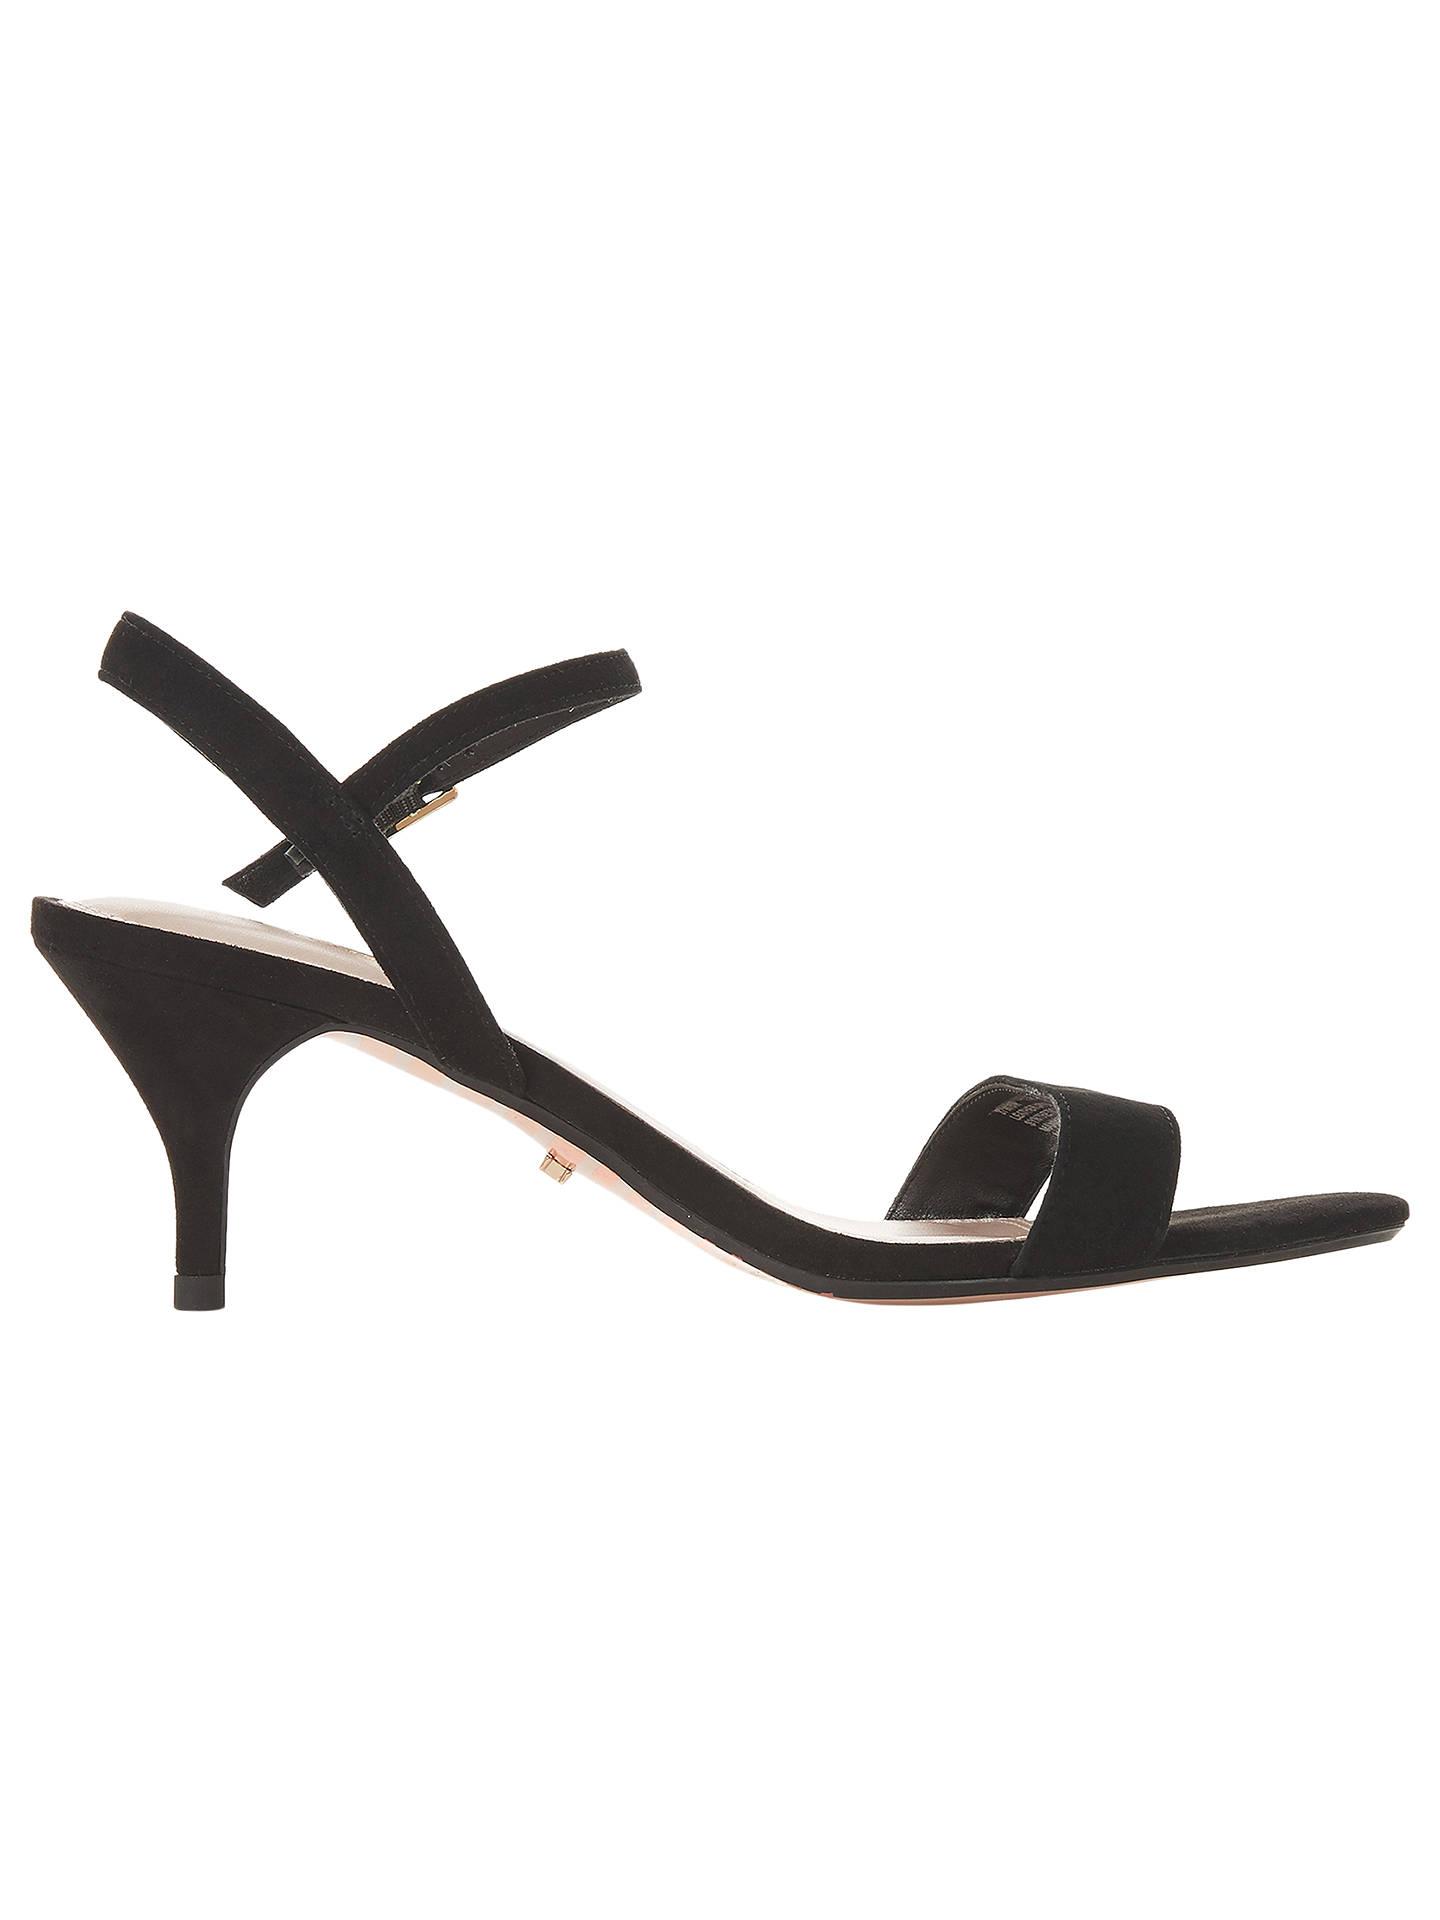 975b0b16a28 Buy Dune Wide Fit Monnrow Two Part Kitten Heel Sandals